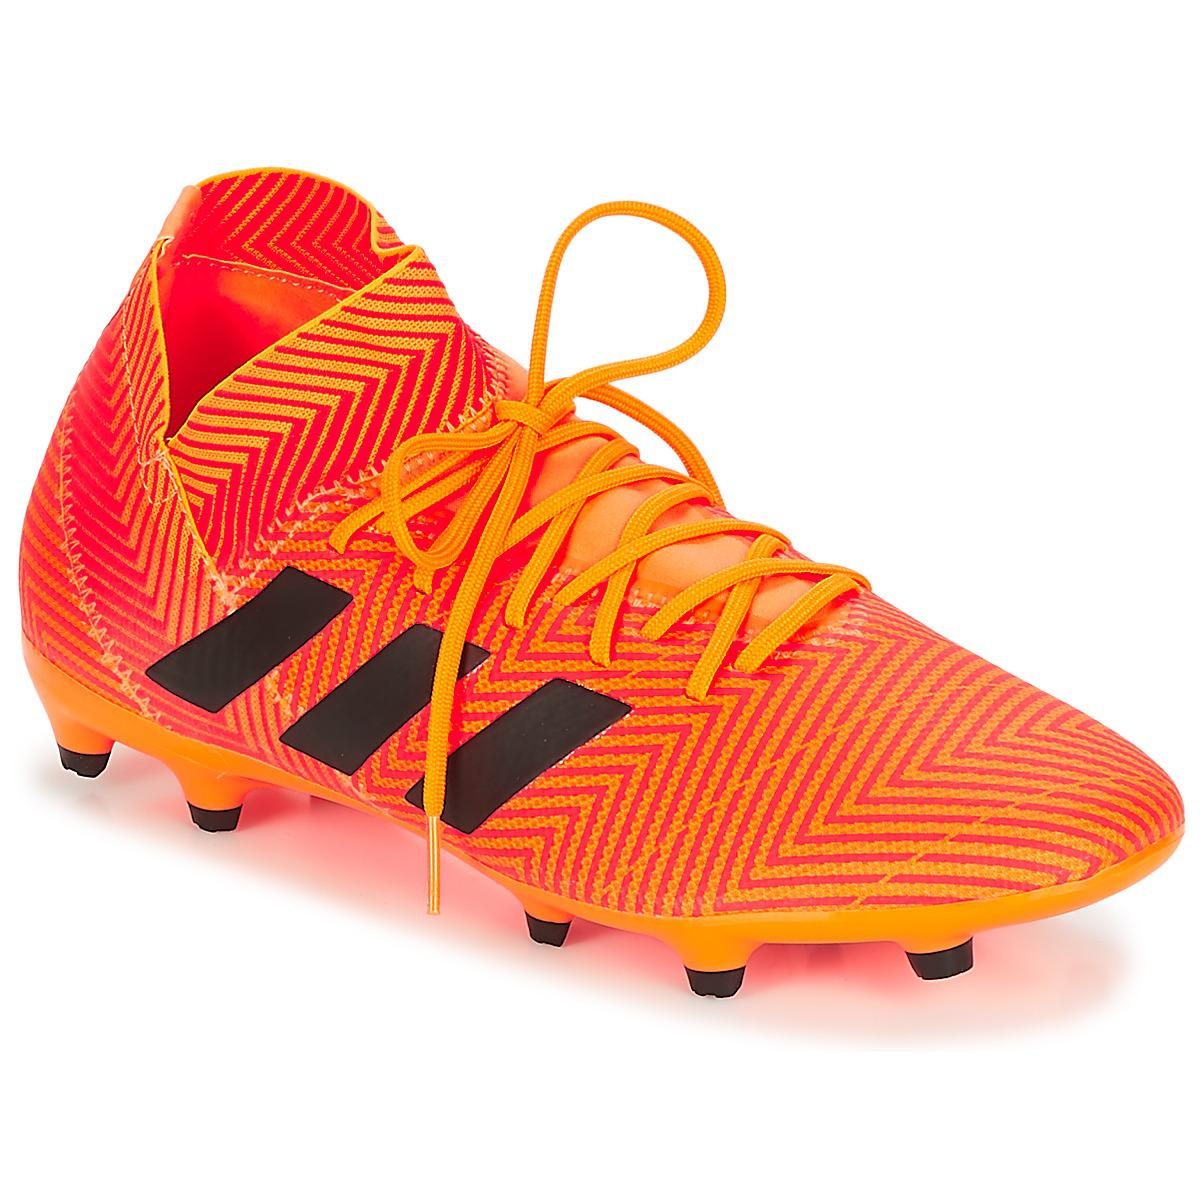 adidas Nemeziz 18.3 Fg Men s Football Boots In Multicolour in Orange ... fd89d69d9cfaf